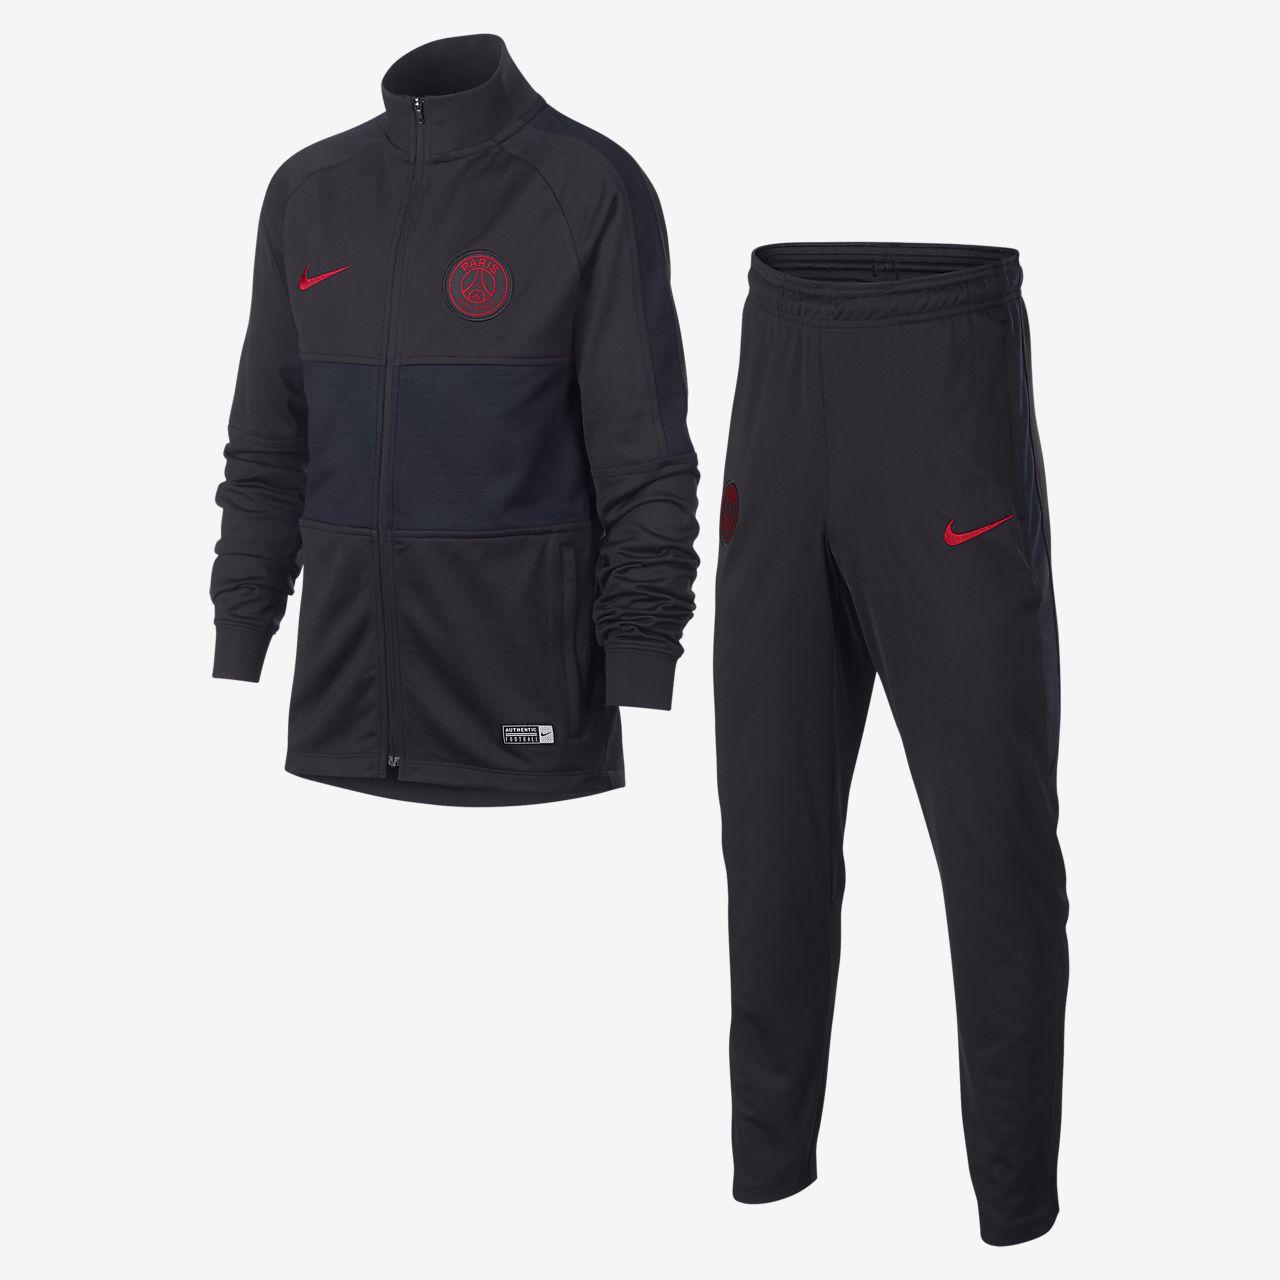 Nike Dri-FIT Paris Saint-Germain Strike-fodboldtracksuit til store børn